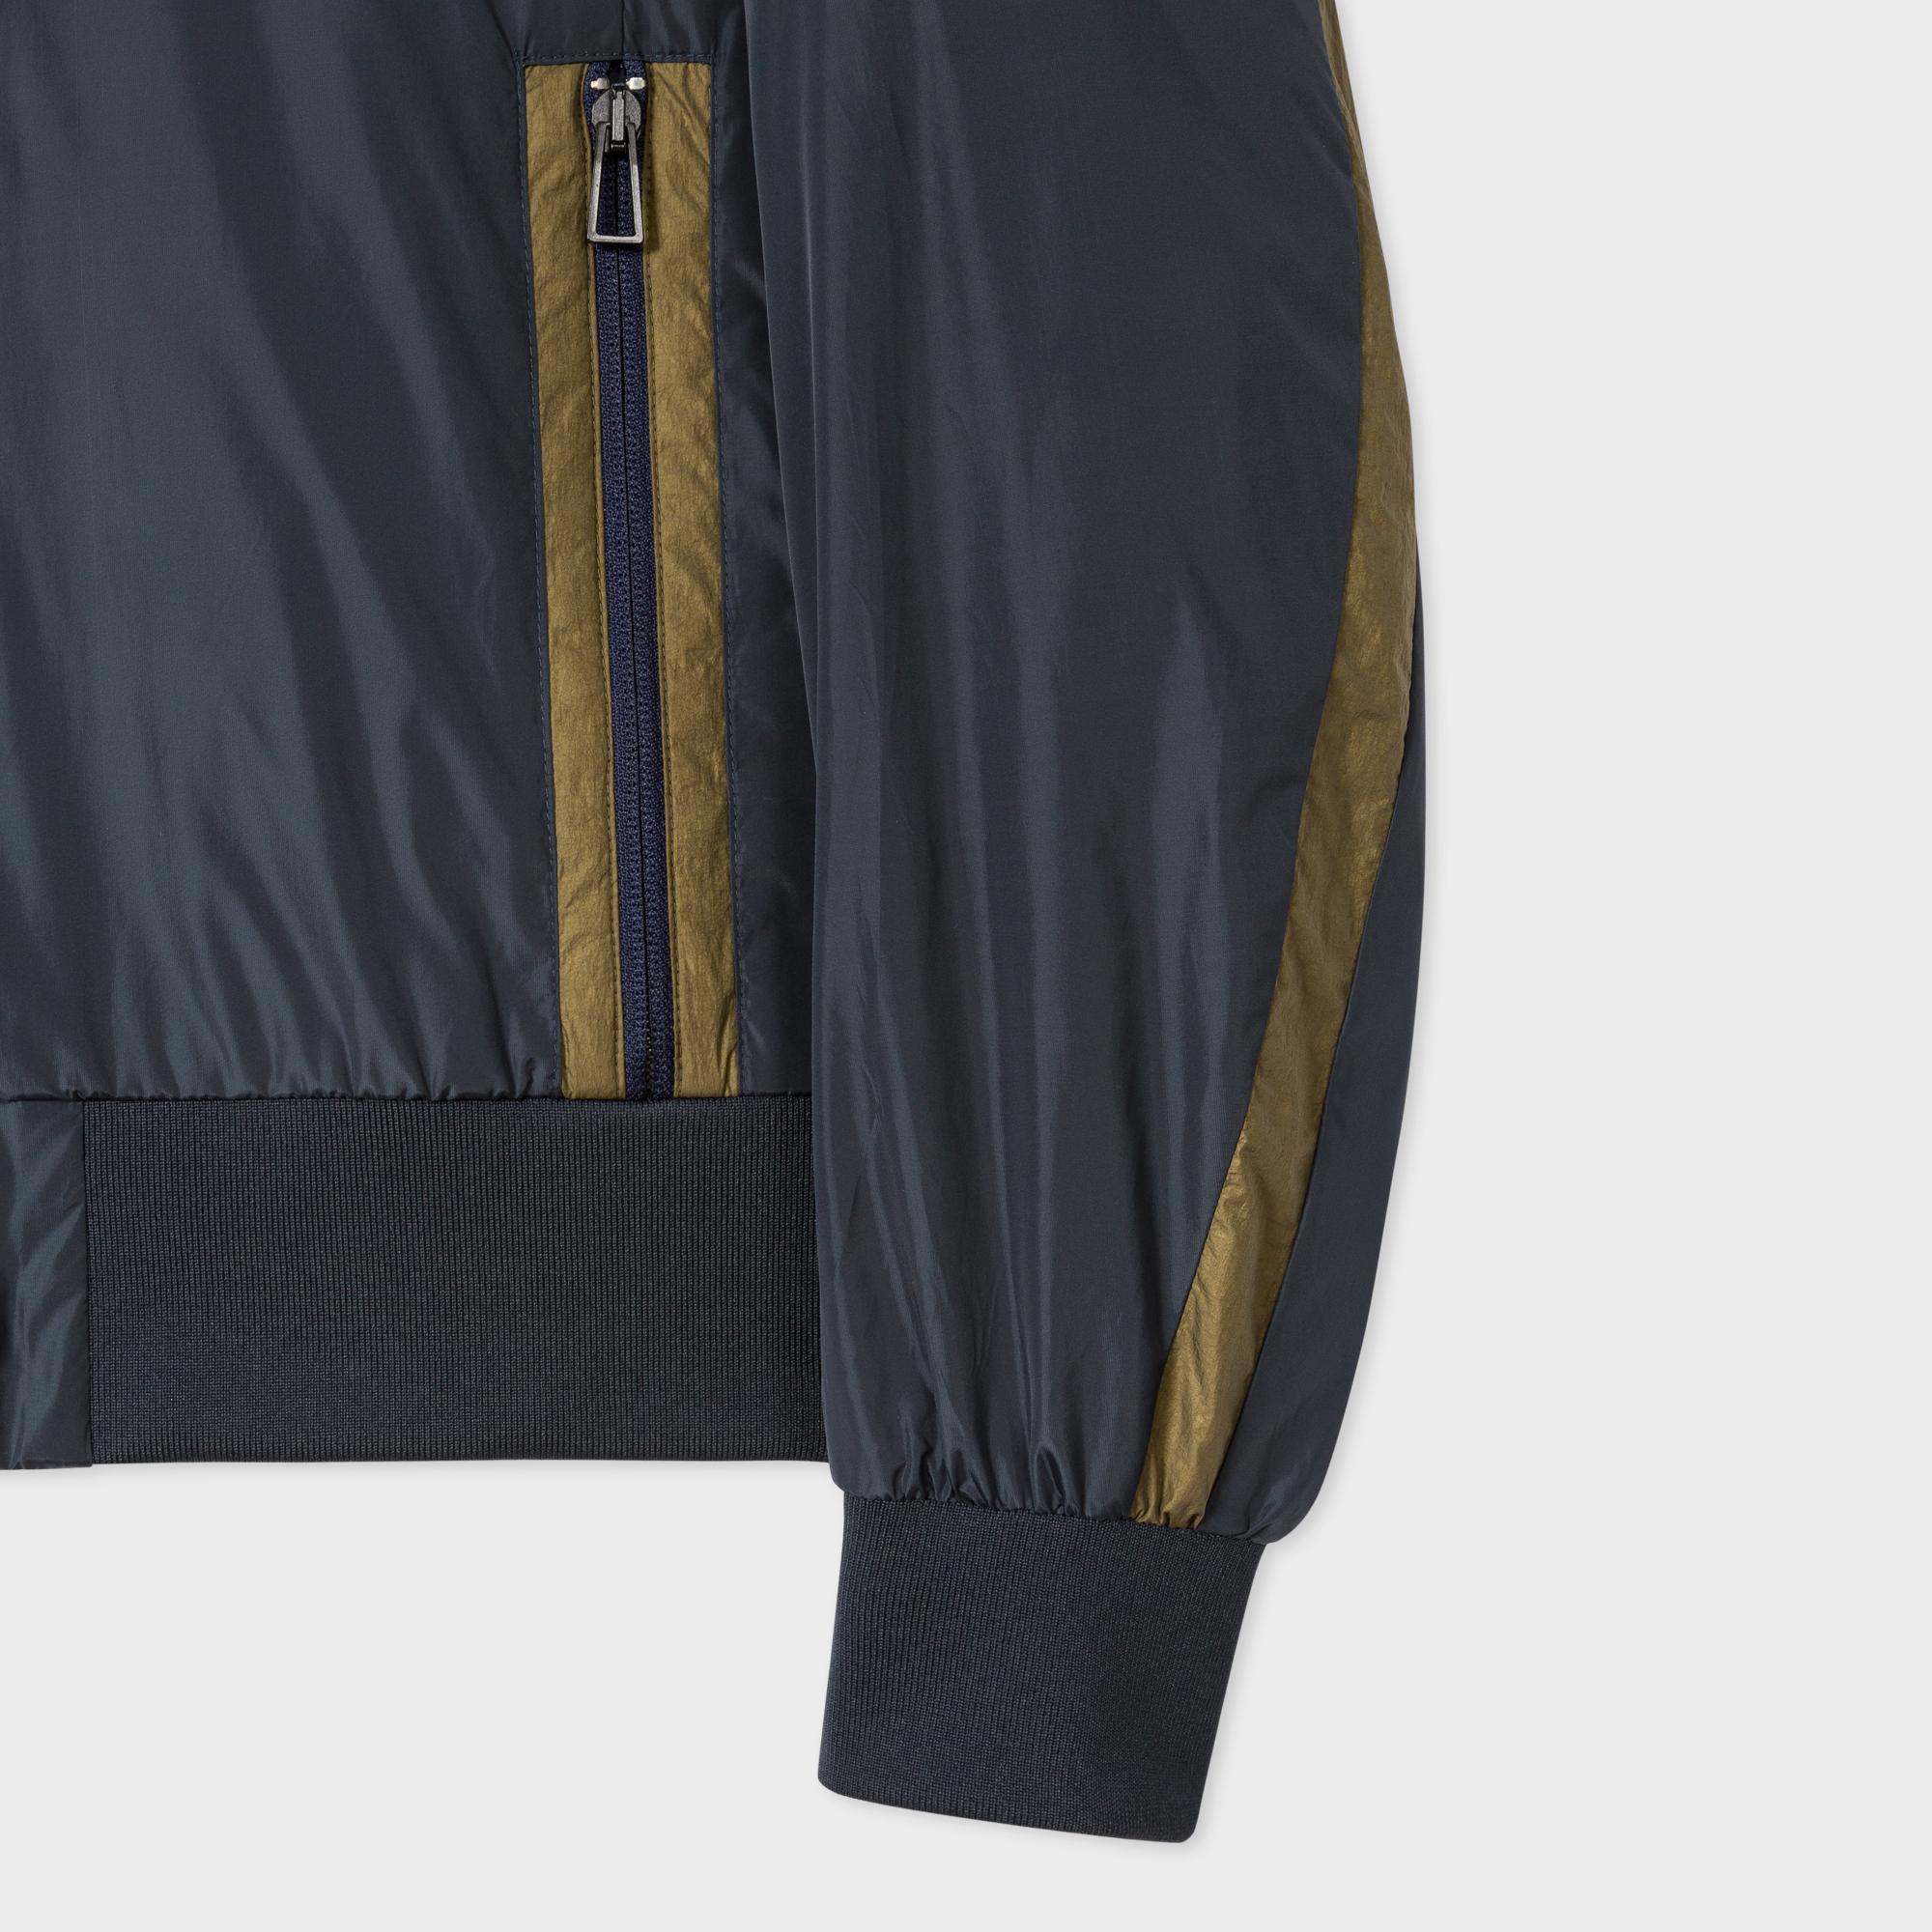 Paul Smith Rubber Men's Navy Lightweight Showerproof Bomber Jacket in Blue for Men